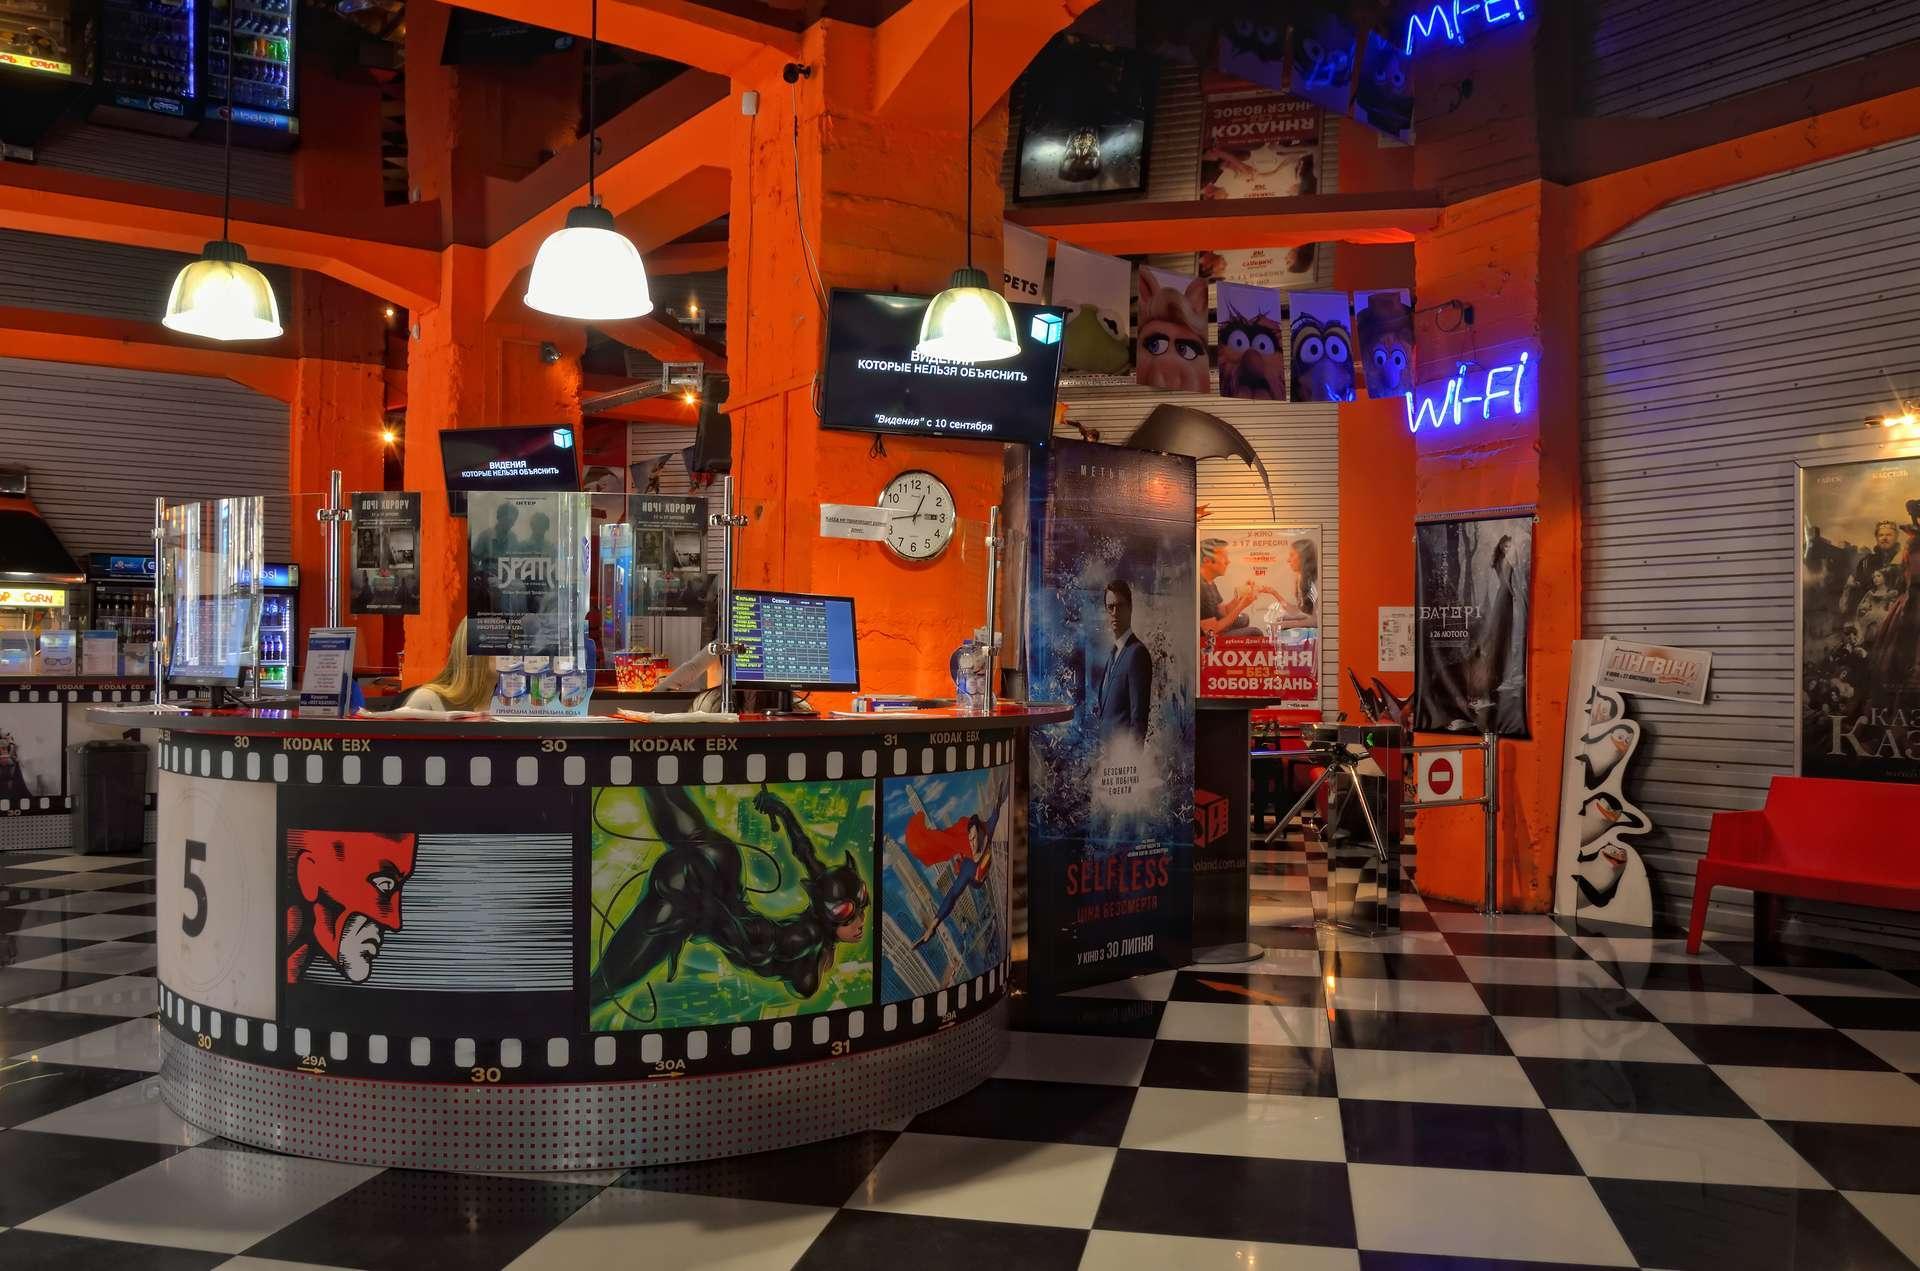 The Cinema Hall 8 .